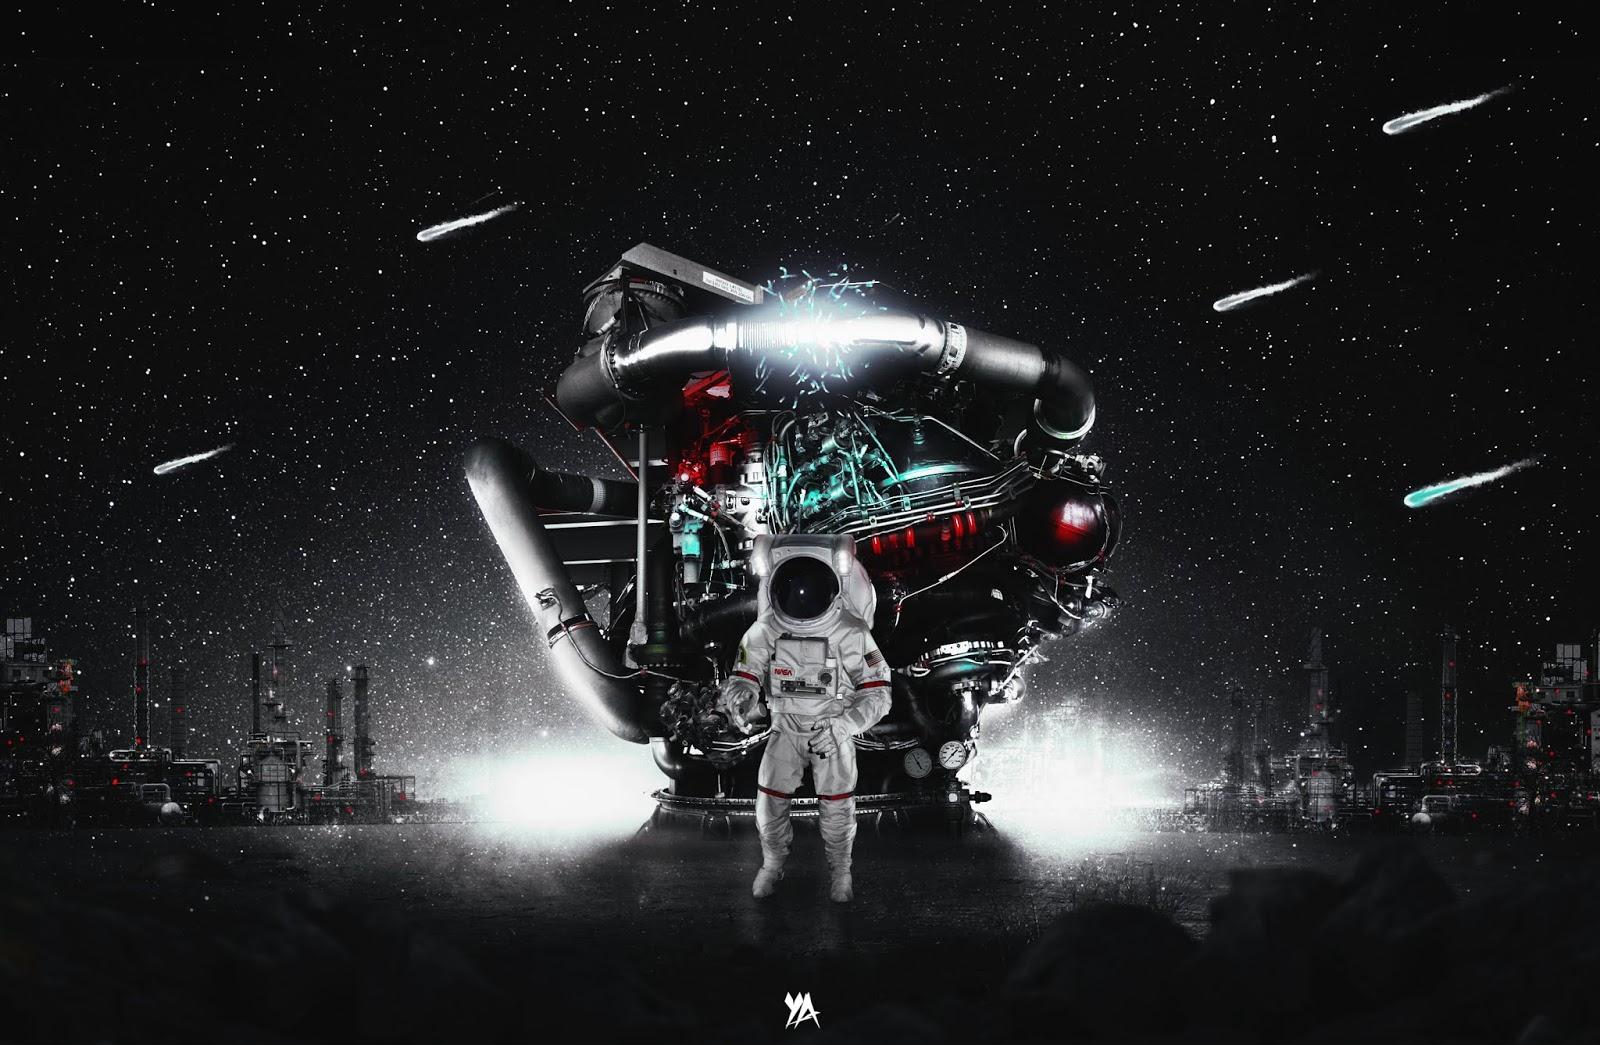 Astronaut, Darkness, Meteors, Black, HD, Space